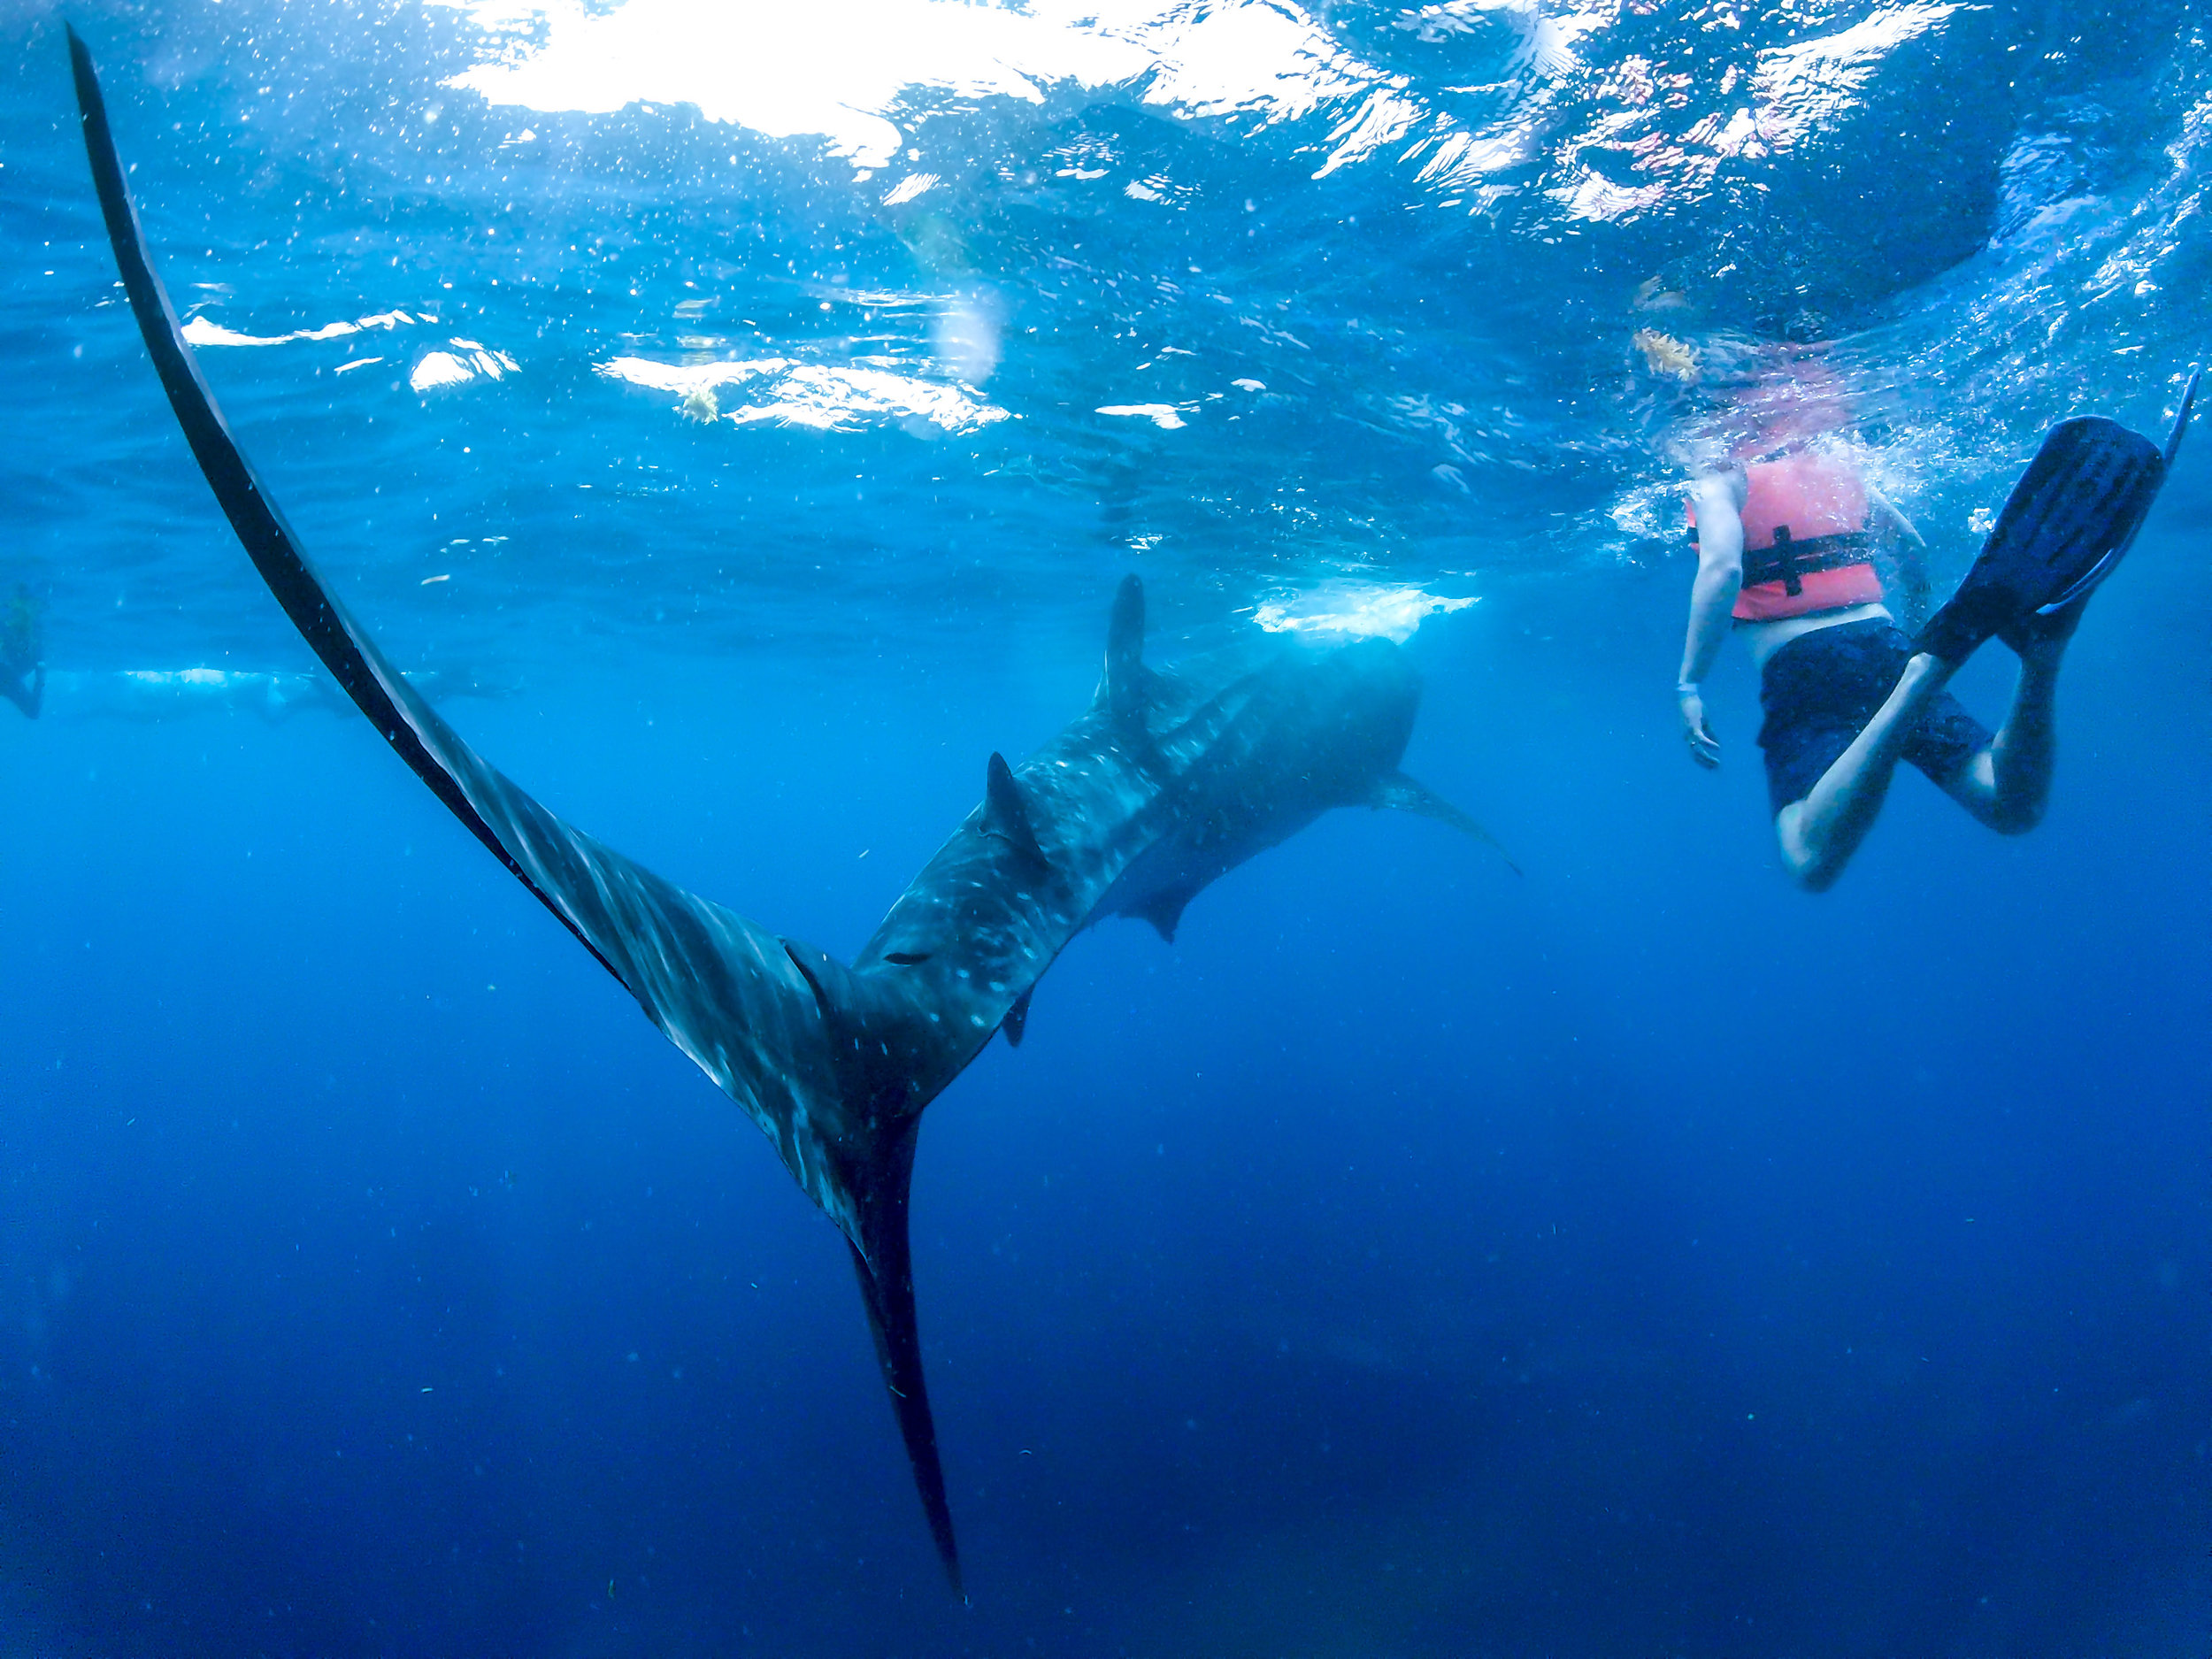 whale.shark12.jpg